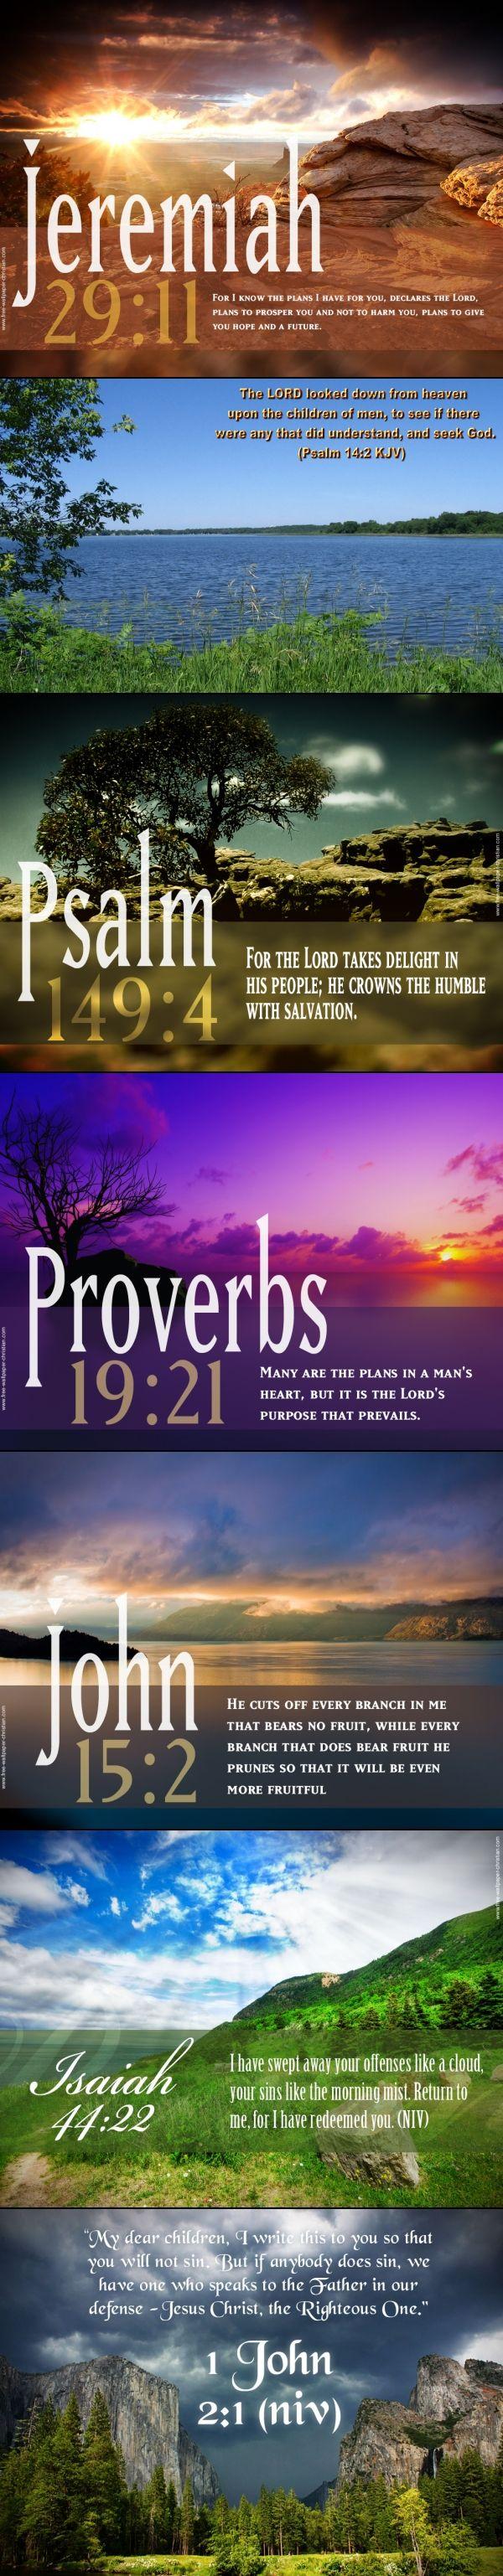 Word of God #WordOfGod #Scripture #Truth #BibleVerse